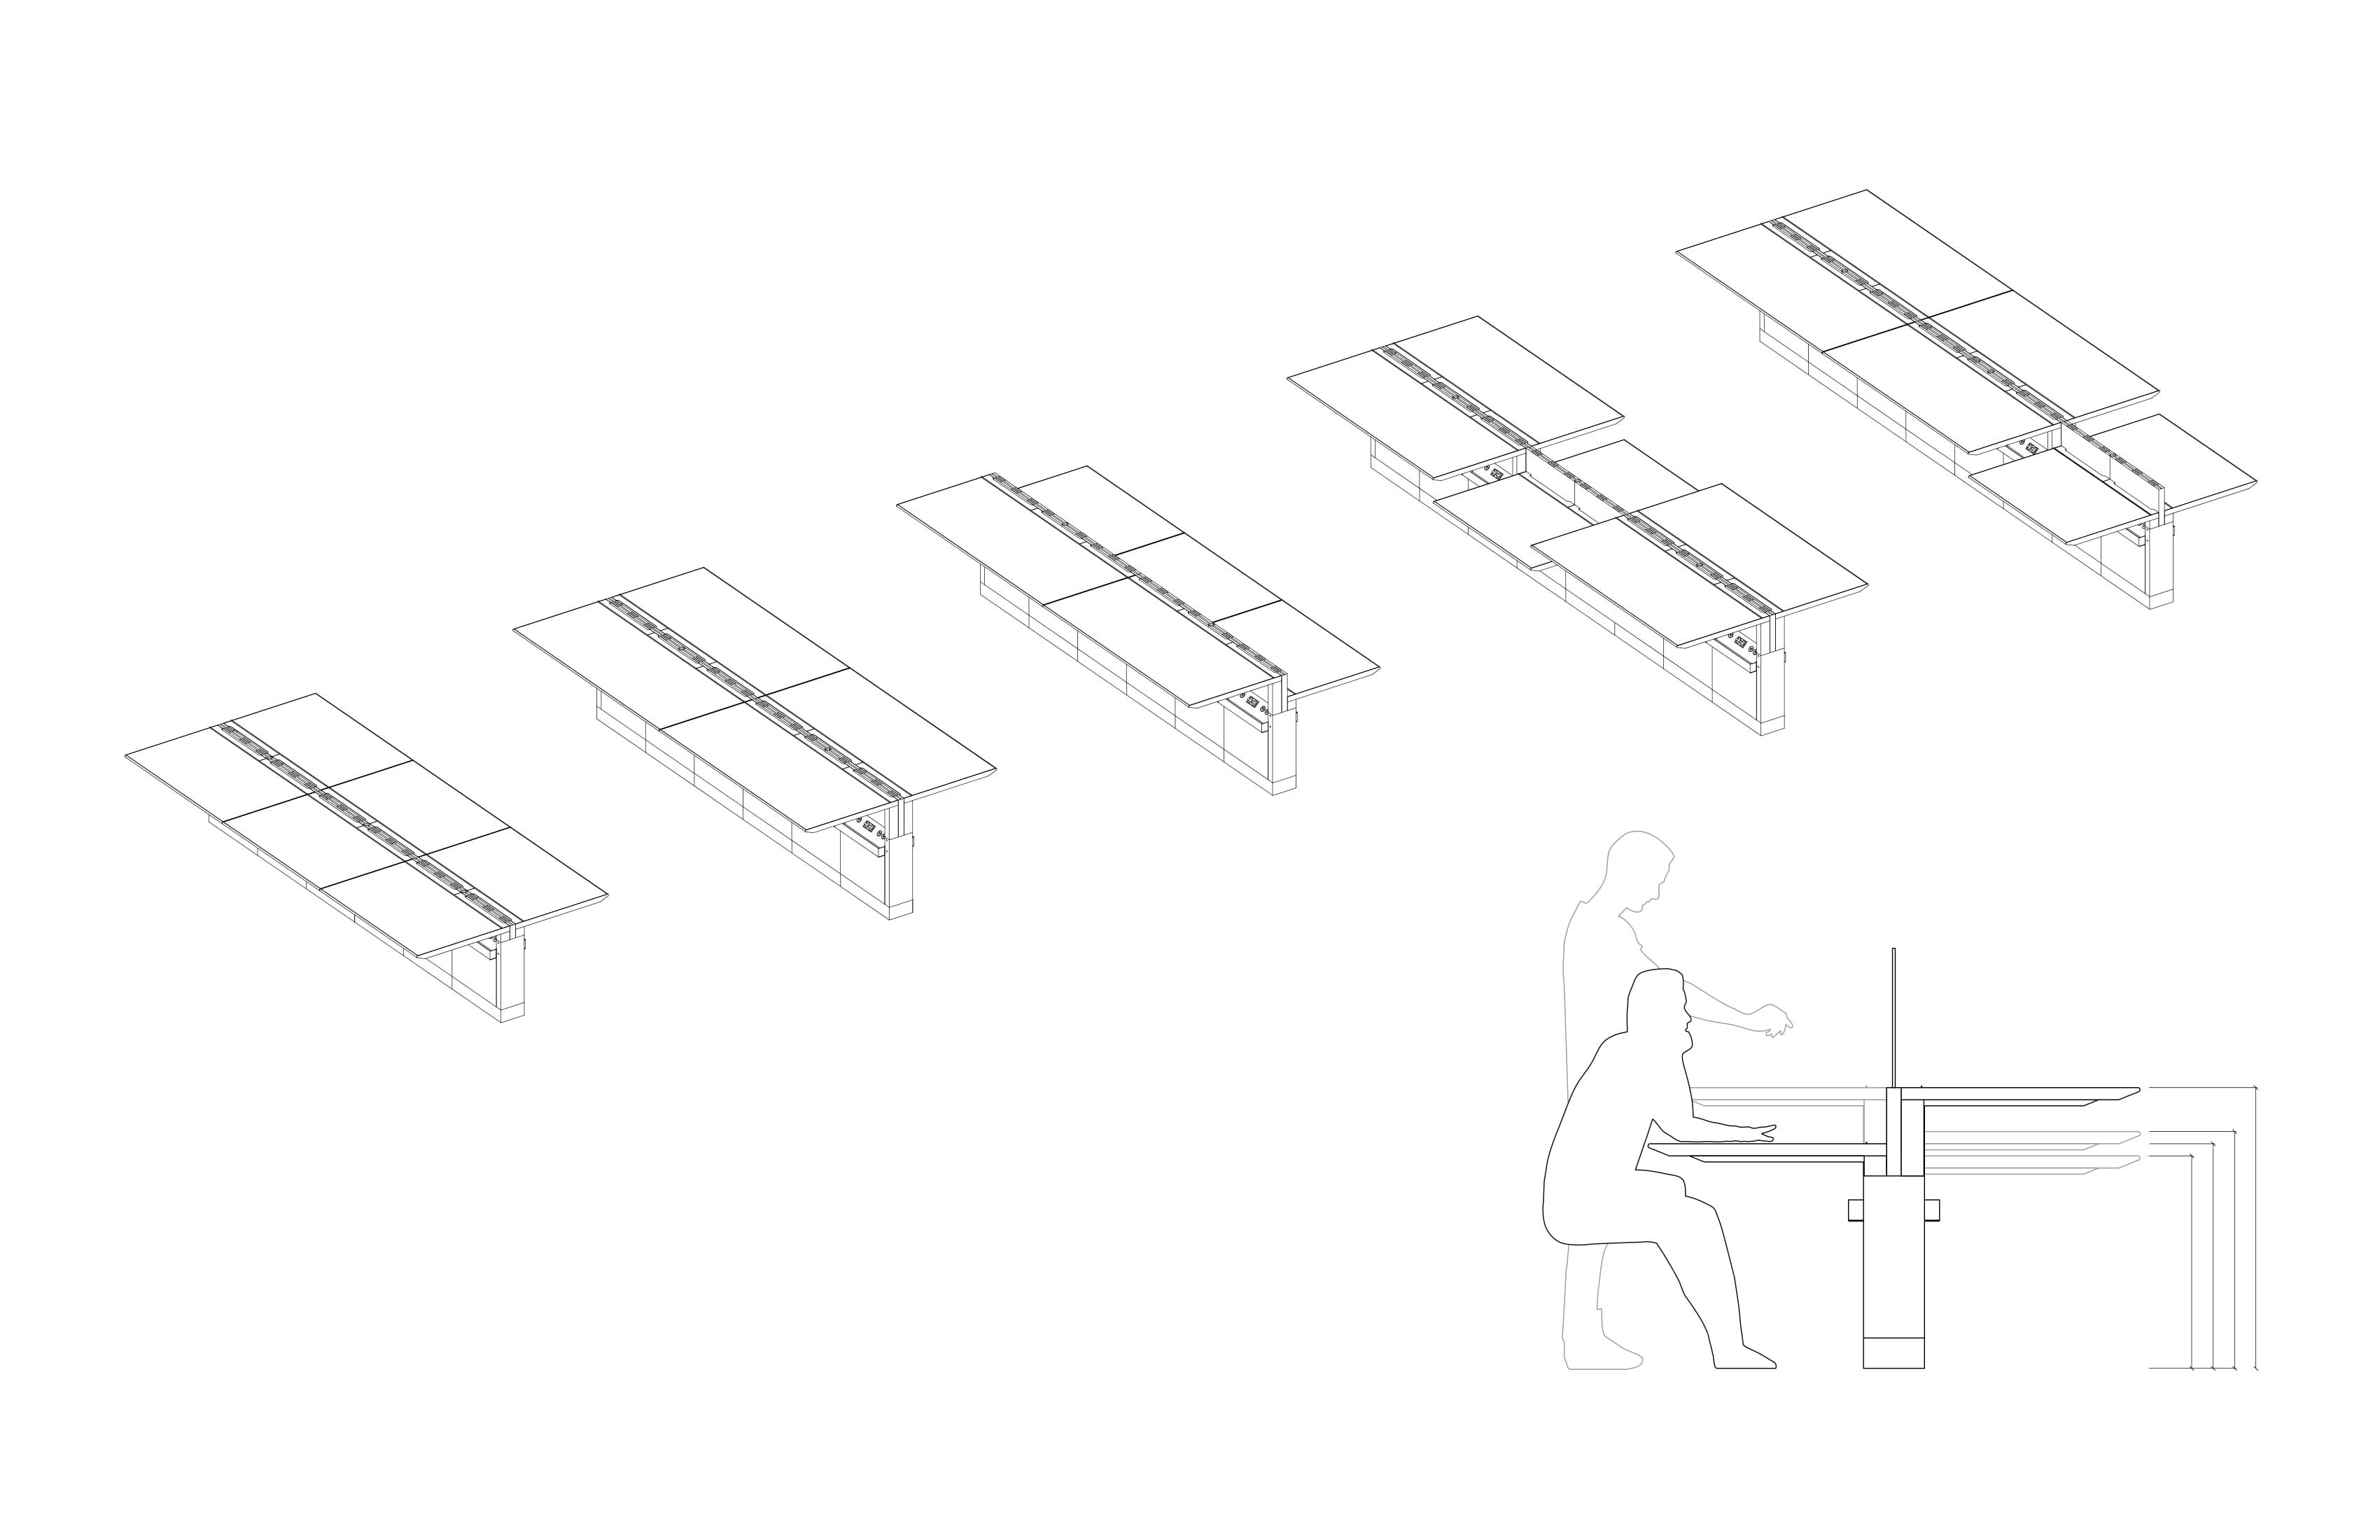 Adjustable settings / configurations through the fixed spine Toshiko Mori Architect}